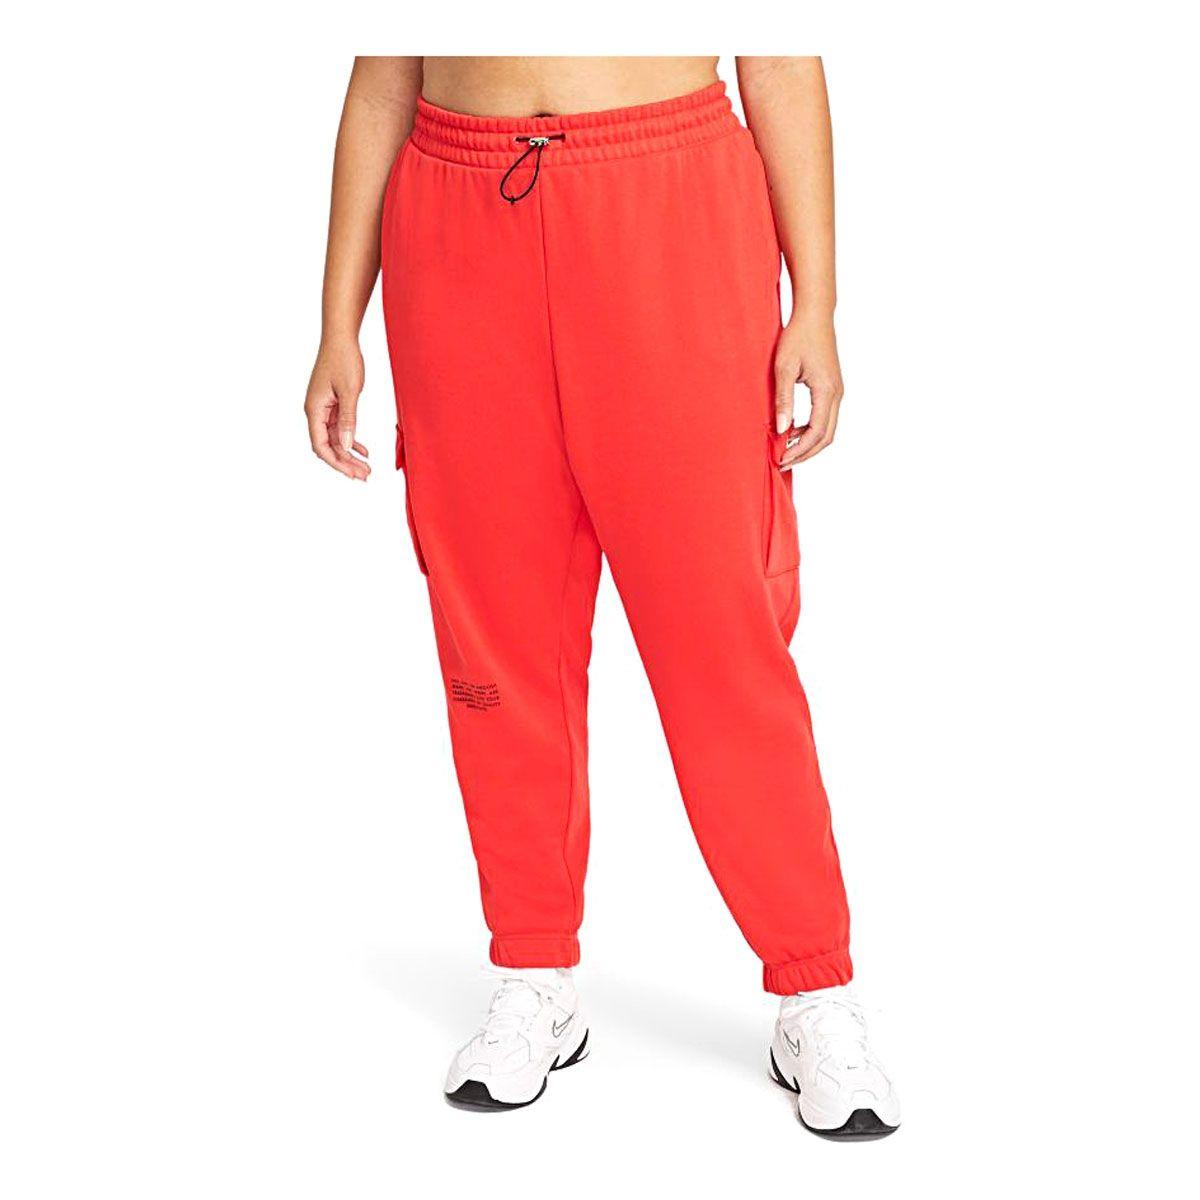 Nike Pantalone Sportswear Swoosh Donna Rosso Nero